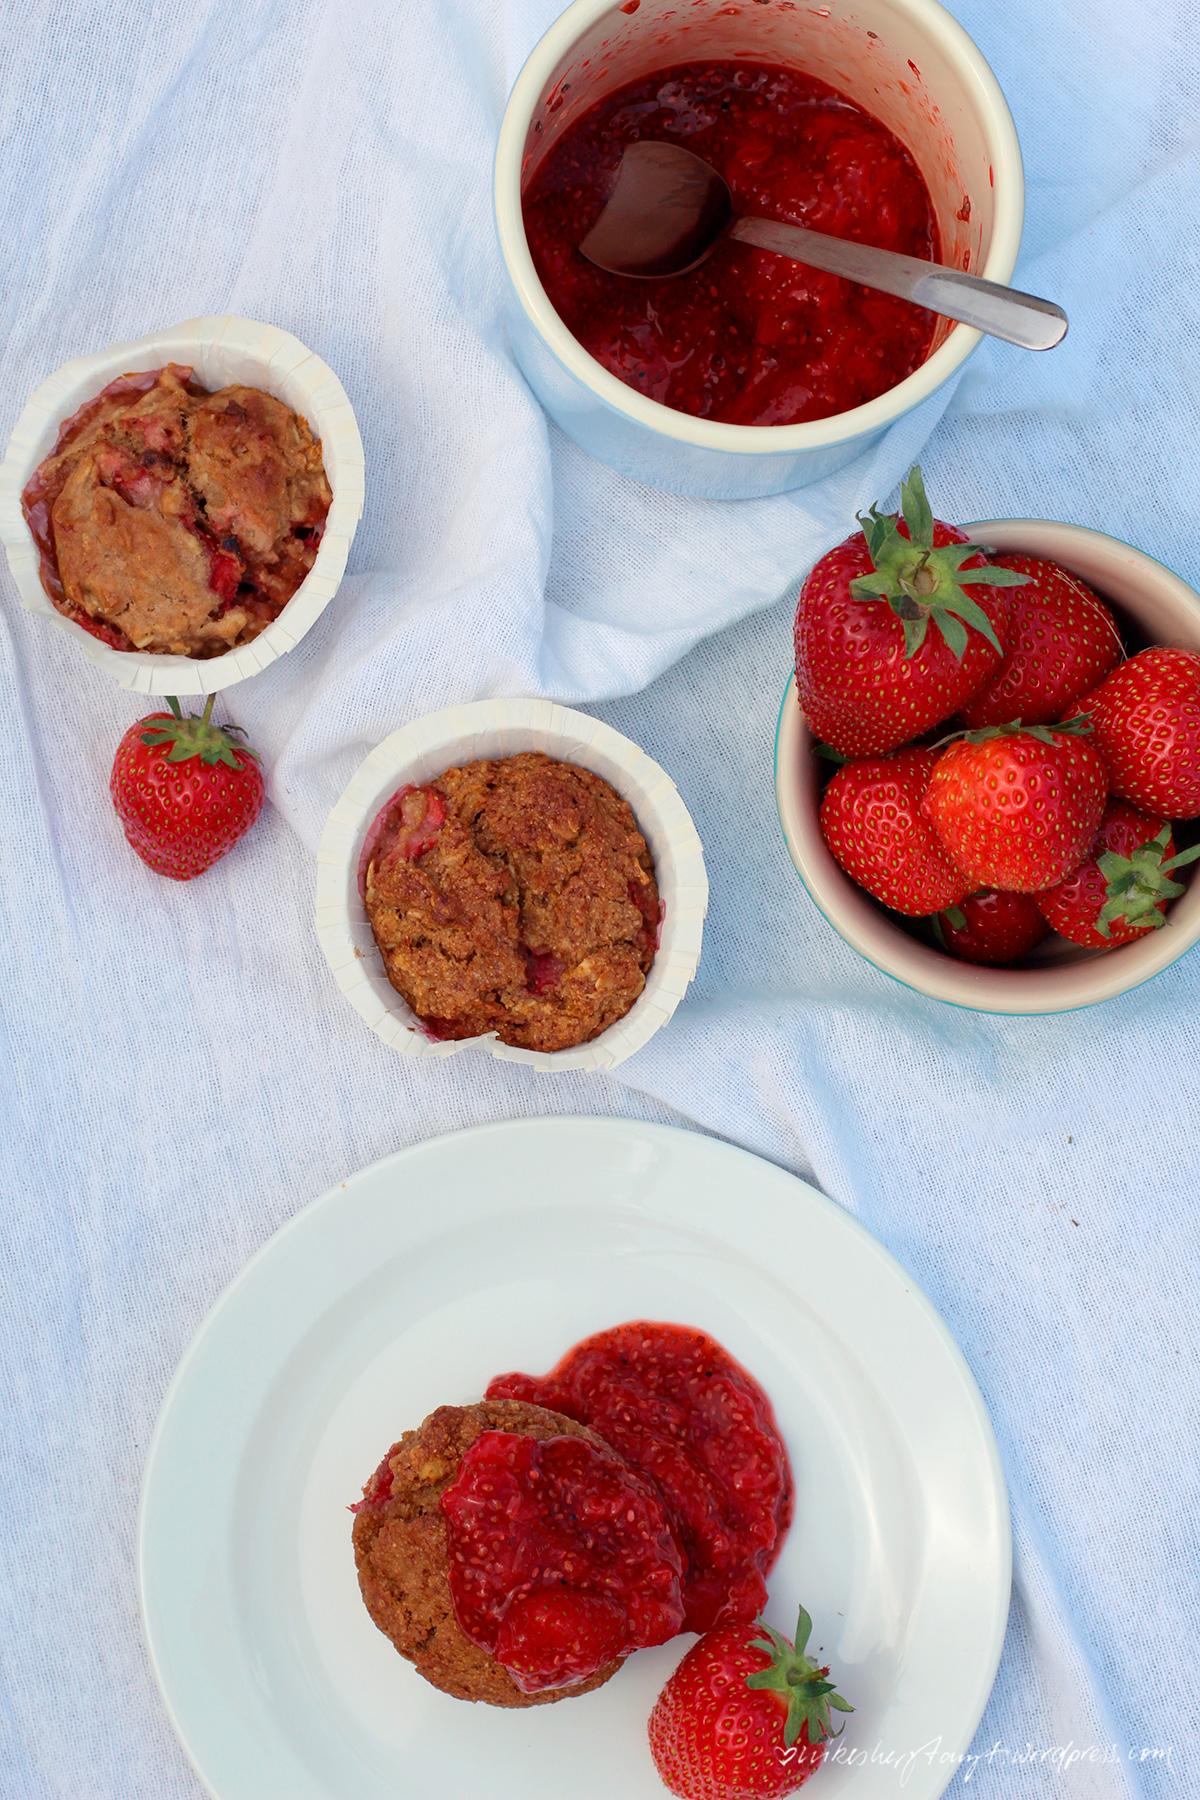 erdbeer fr hst cks muffins mit erdbeer chia marmelade nikes herz tanzt. Black Bedroom Furniture Sets. Home Design Ideas